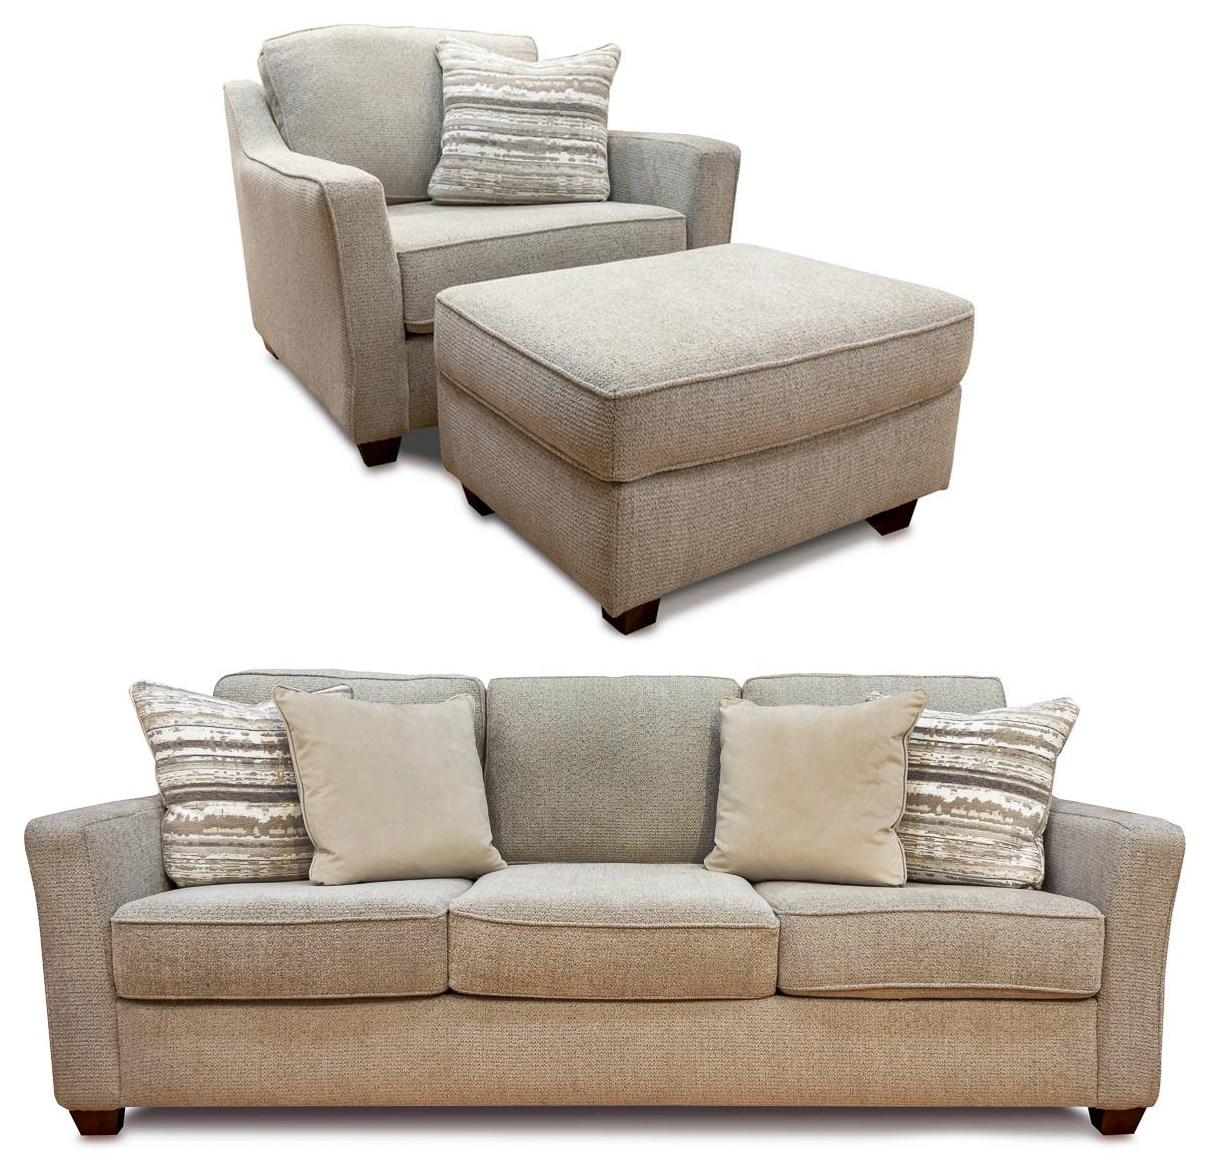 Tiffany 3PC Sofa, Chair & Ottoman Set at Rotmans